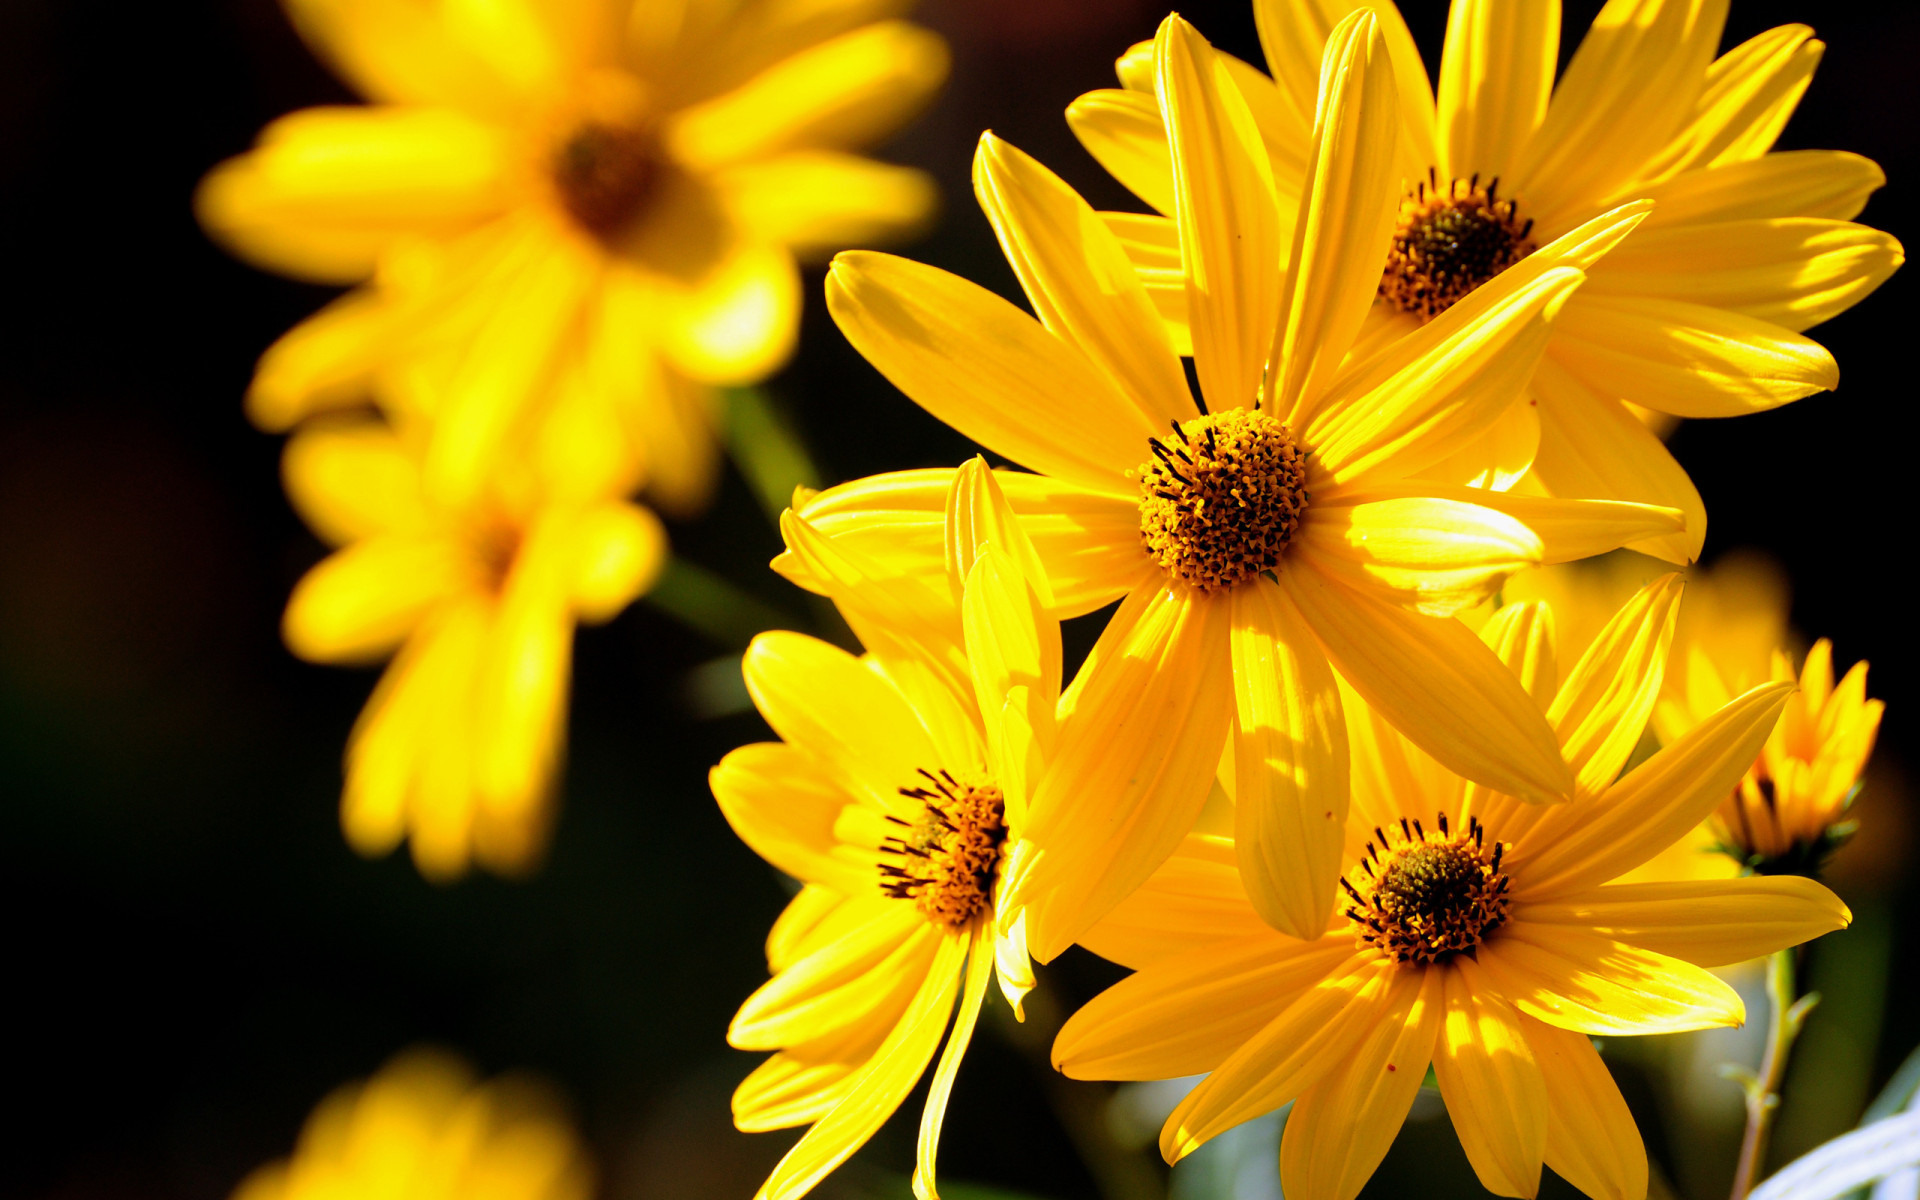 Картинки на телефон с желтым цветом